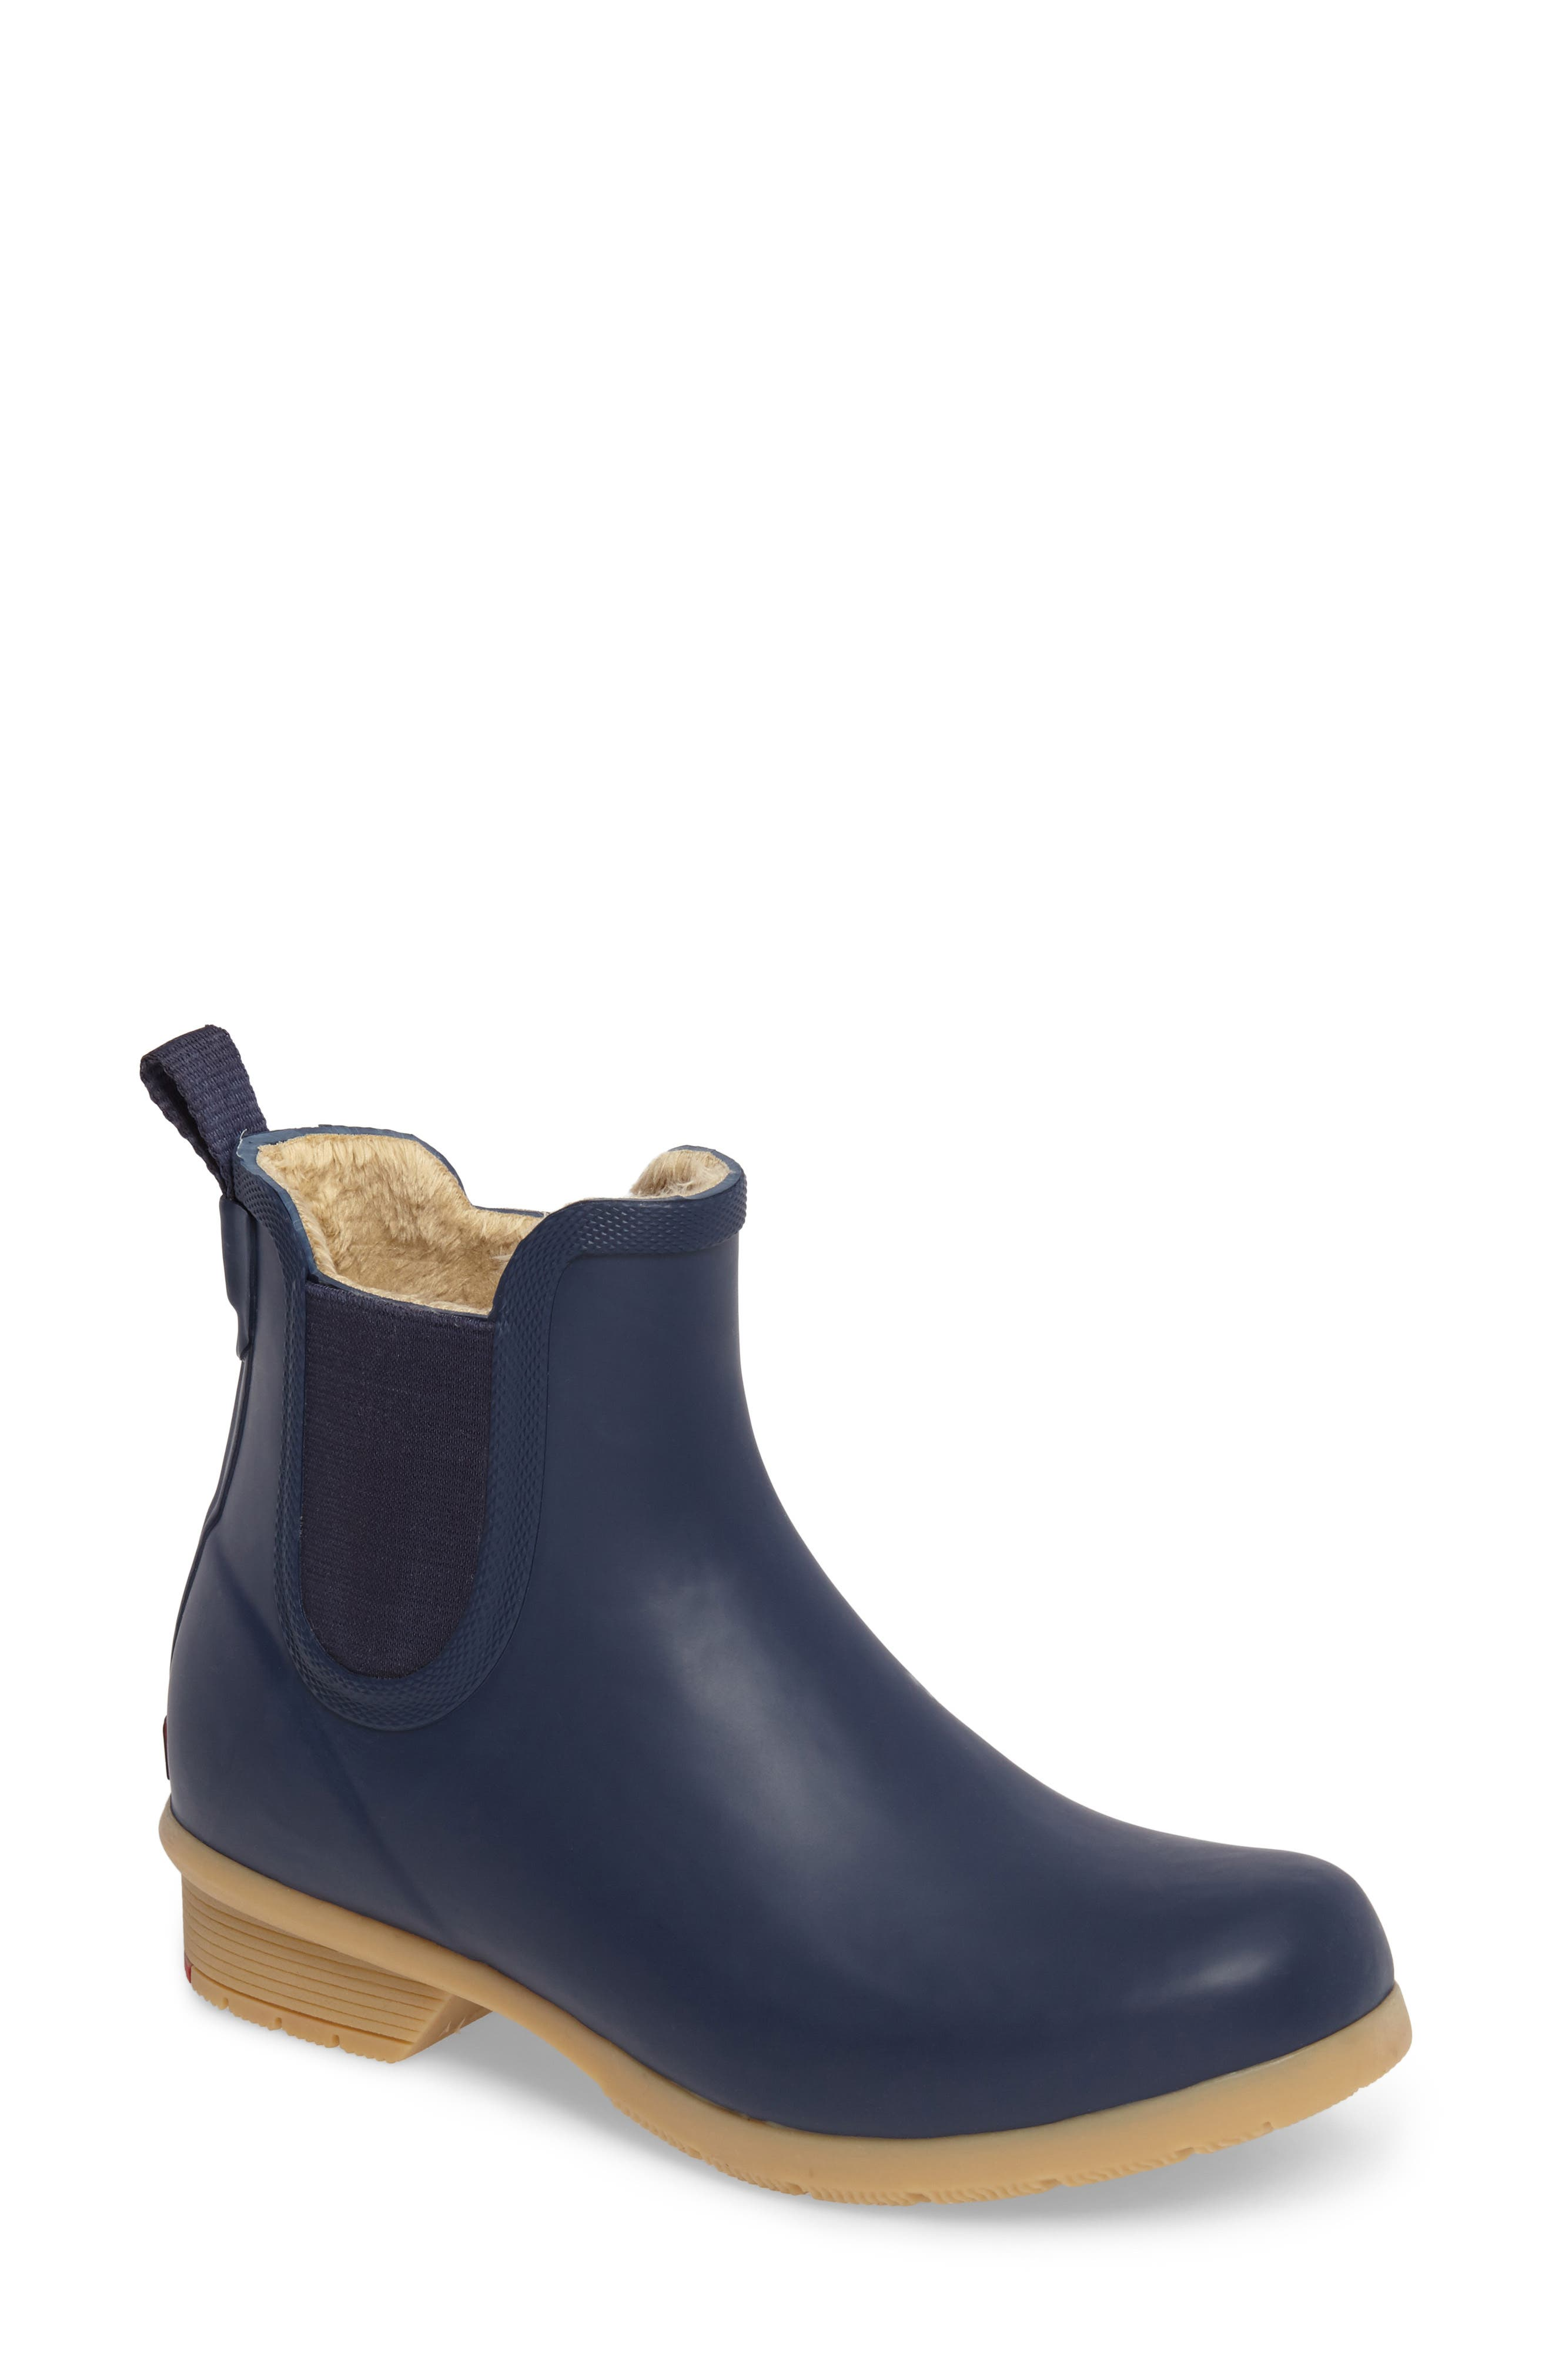 CHOOKA Bainbridge Chelsea Rain Boot, Main, color, NAVY